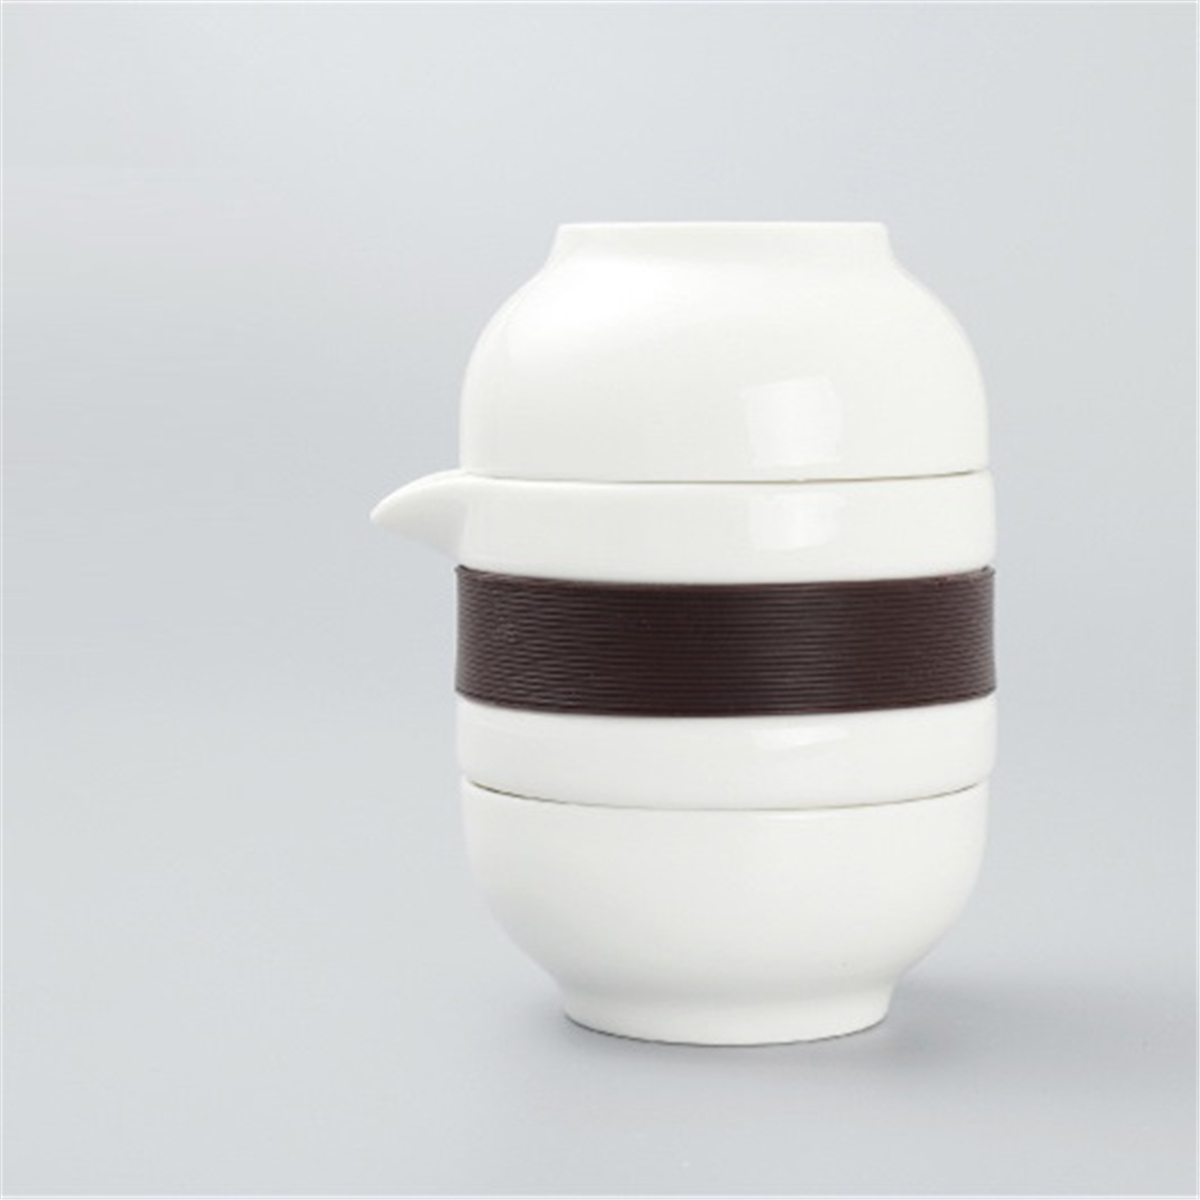 3PCS / Set 3 In 1 Tea Cup Ceramic Tea Set Portable Kung Fu Tea Pot With Bag Chinese Travel